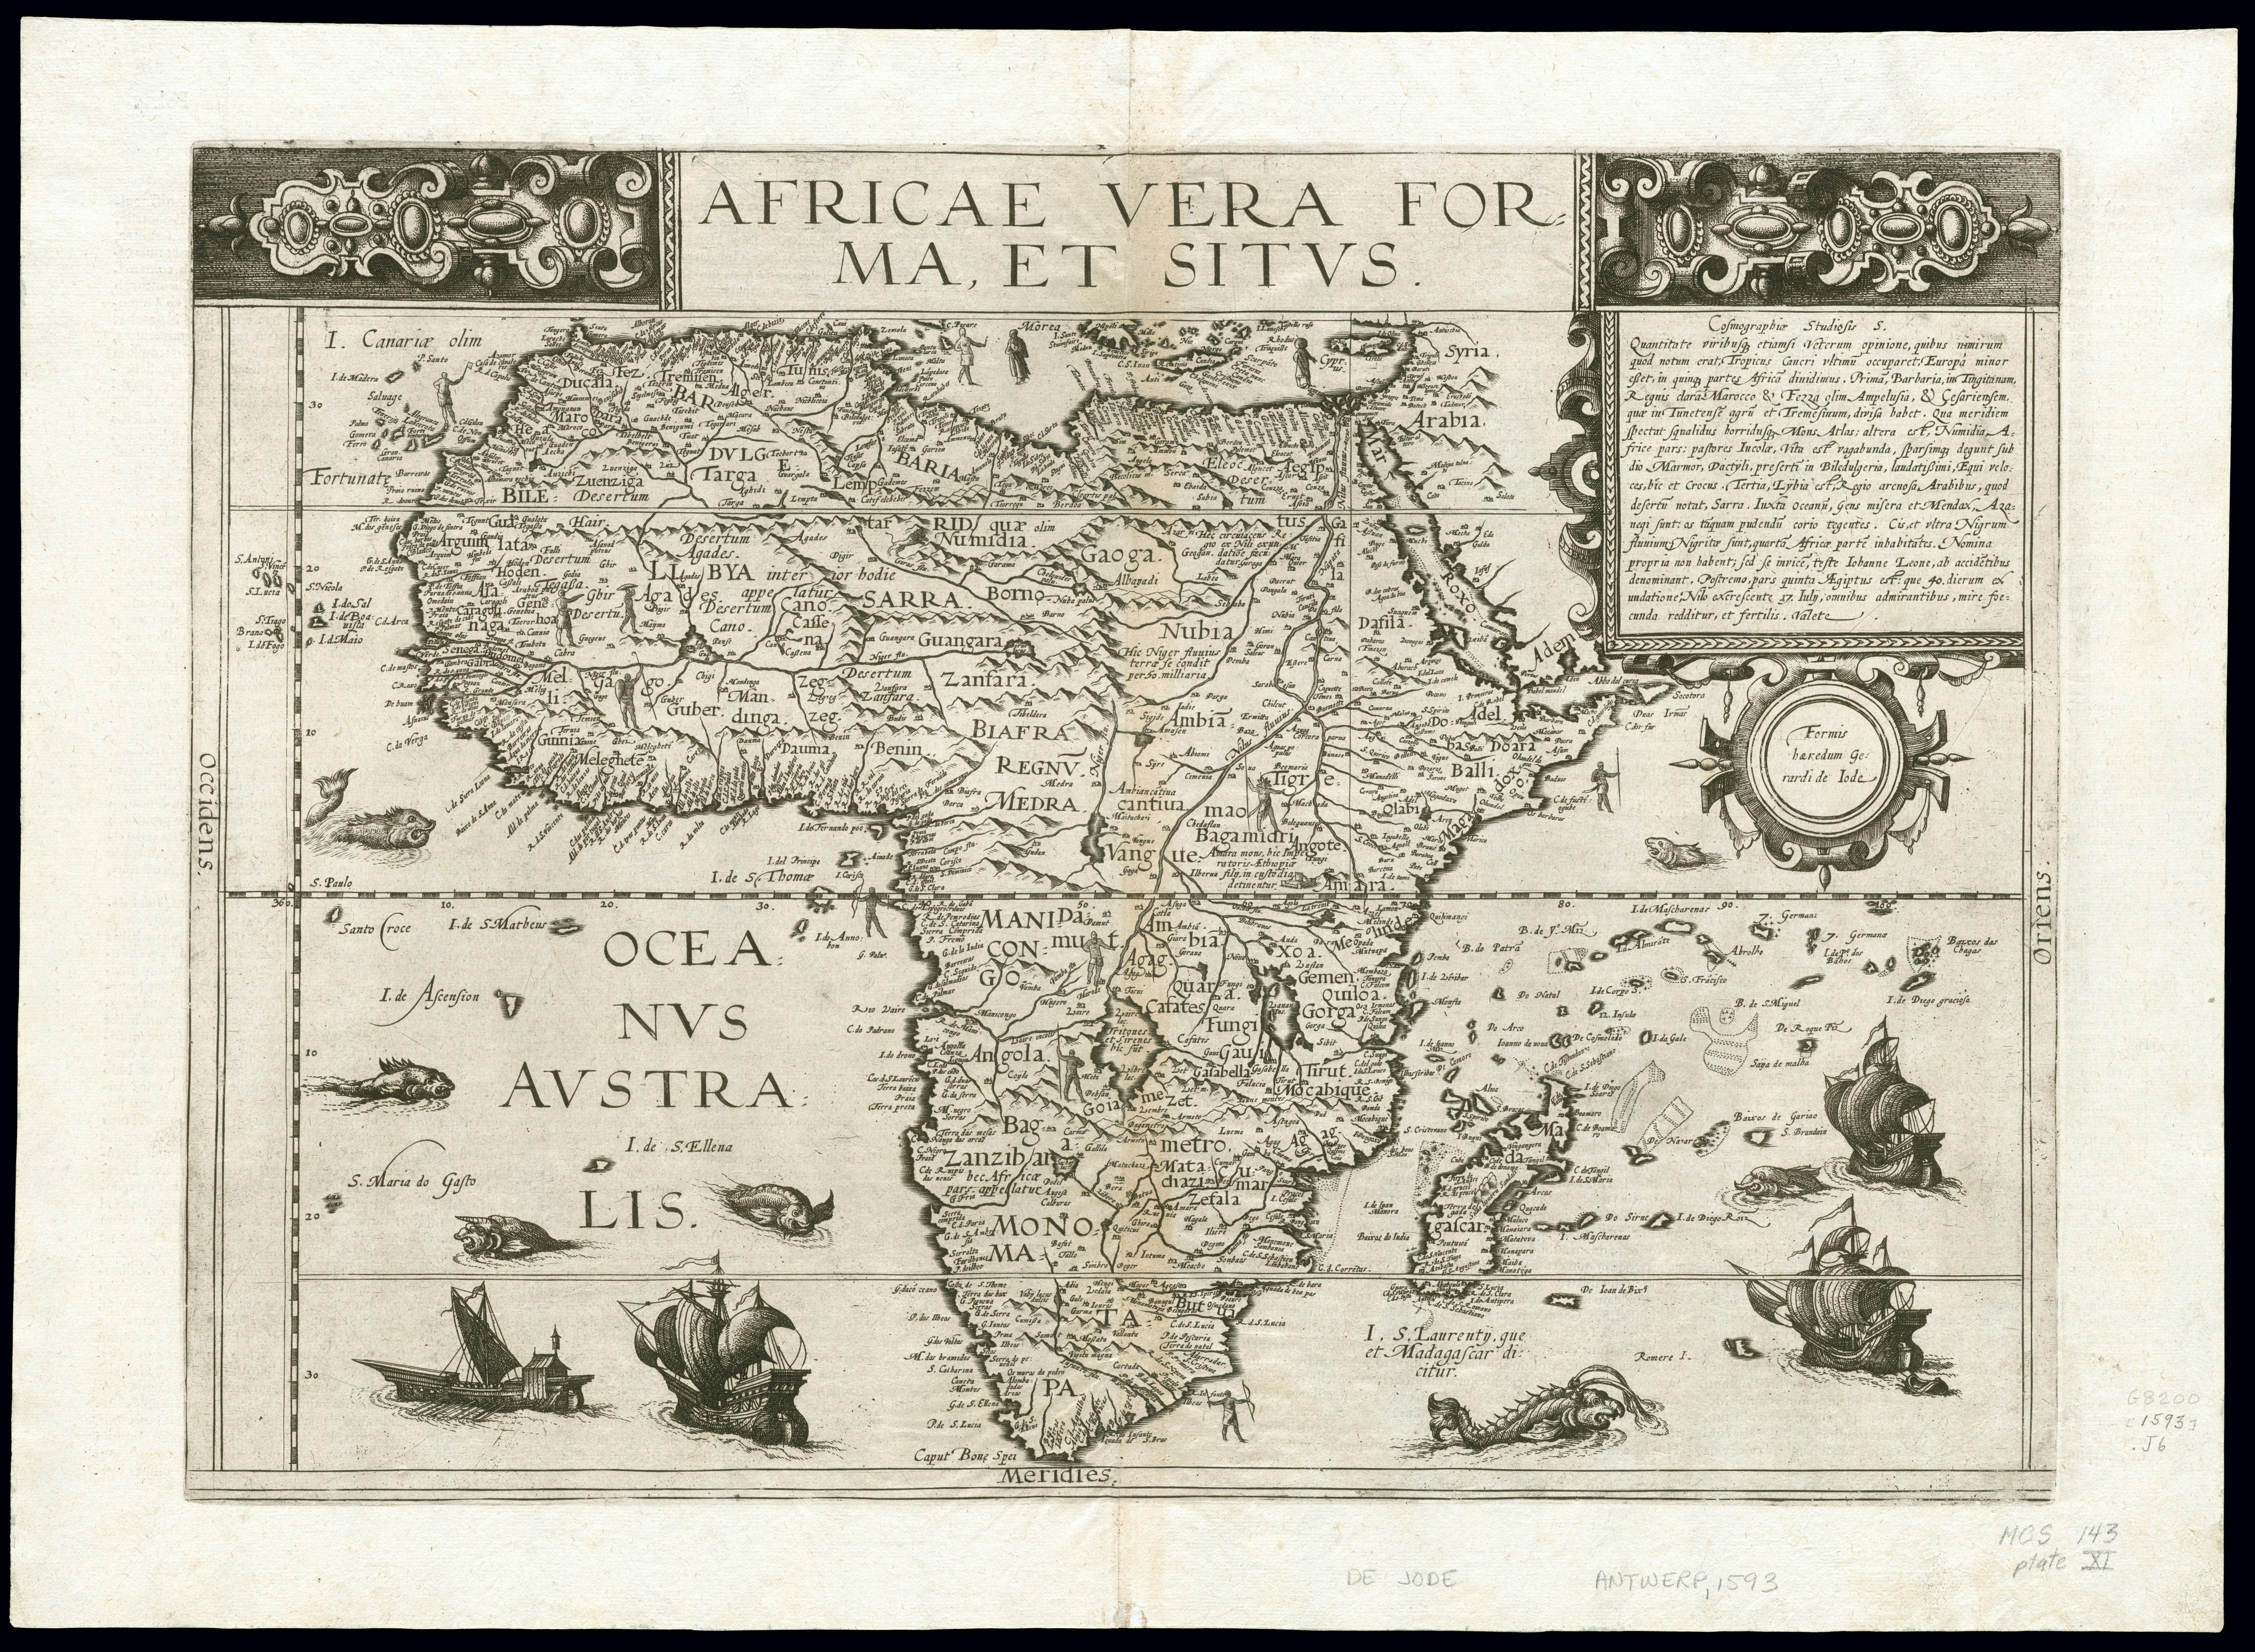 File:Africa 1593, Gerard de Jode (3805116-recto).jpg